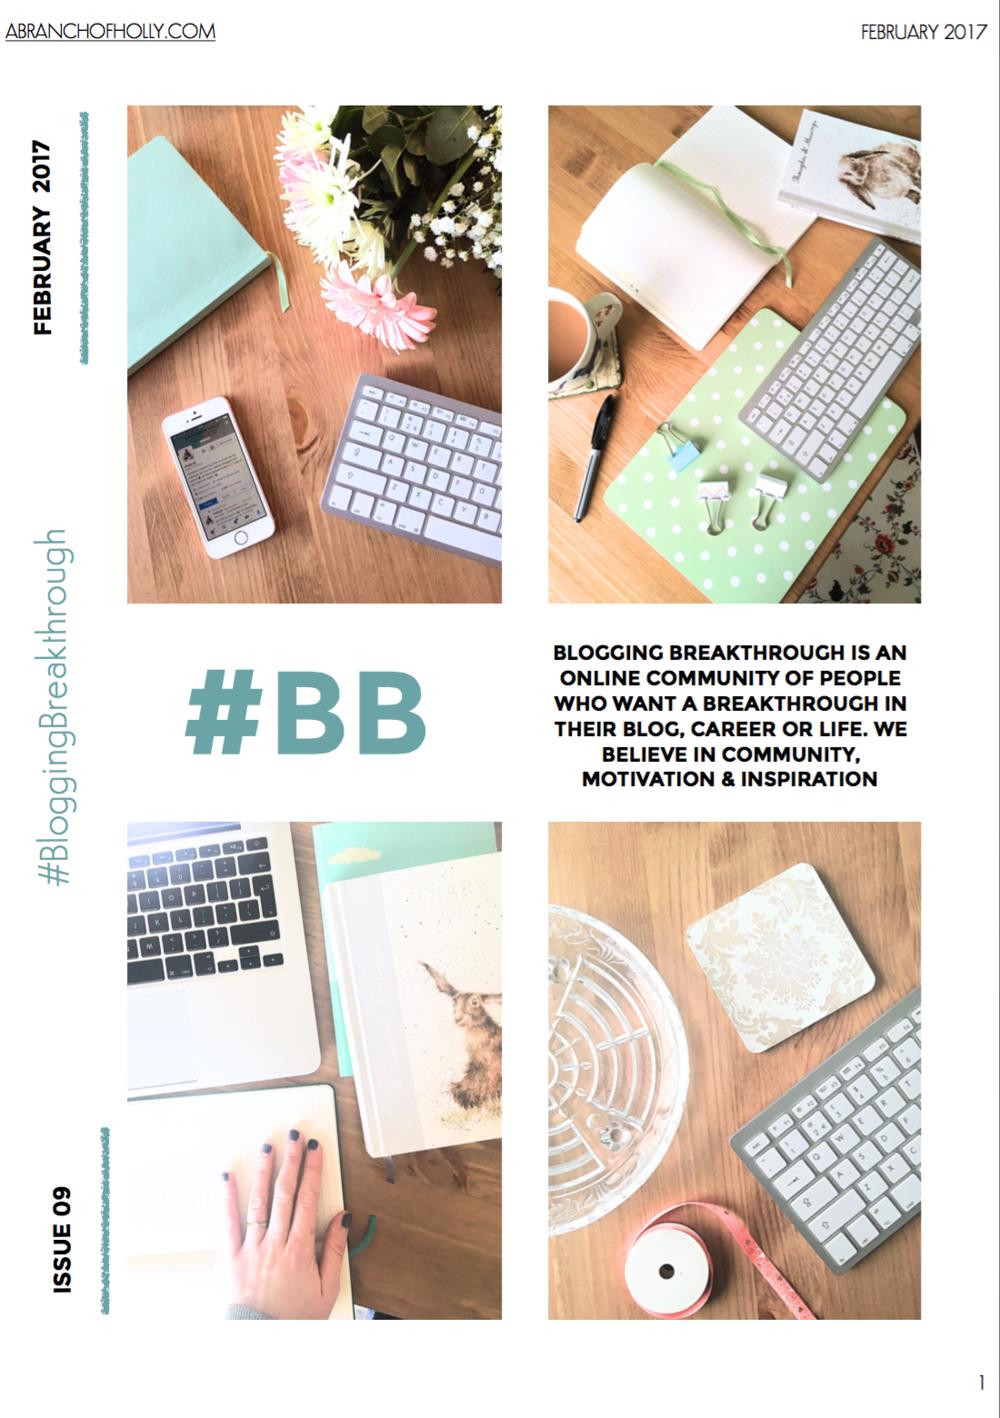 blogging breakthrough february 2017 issue 09